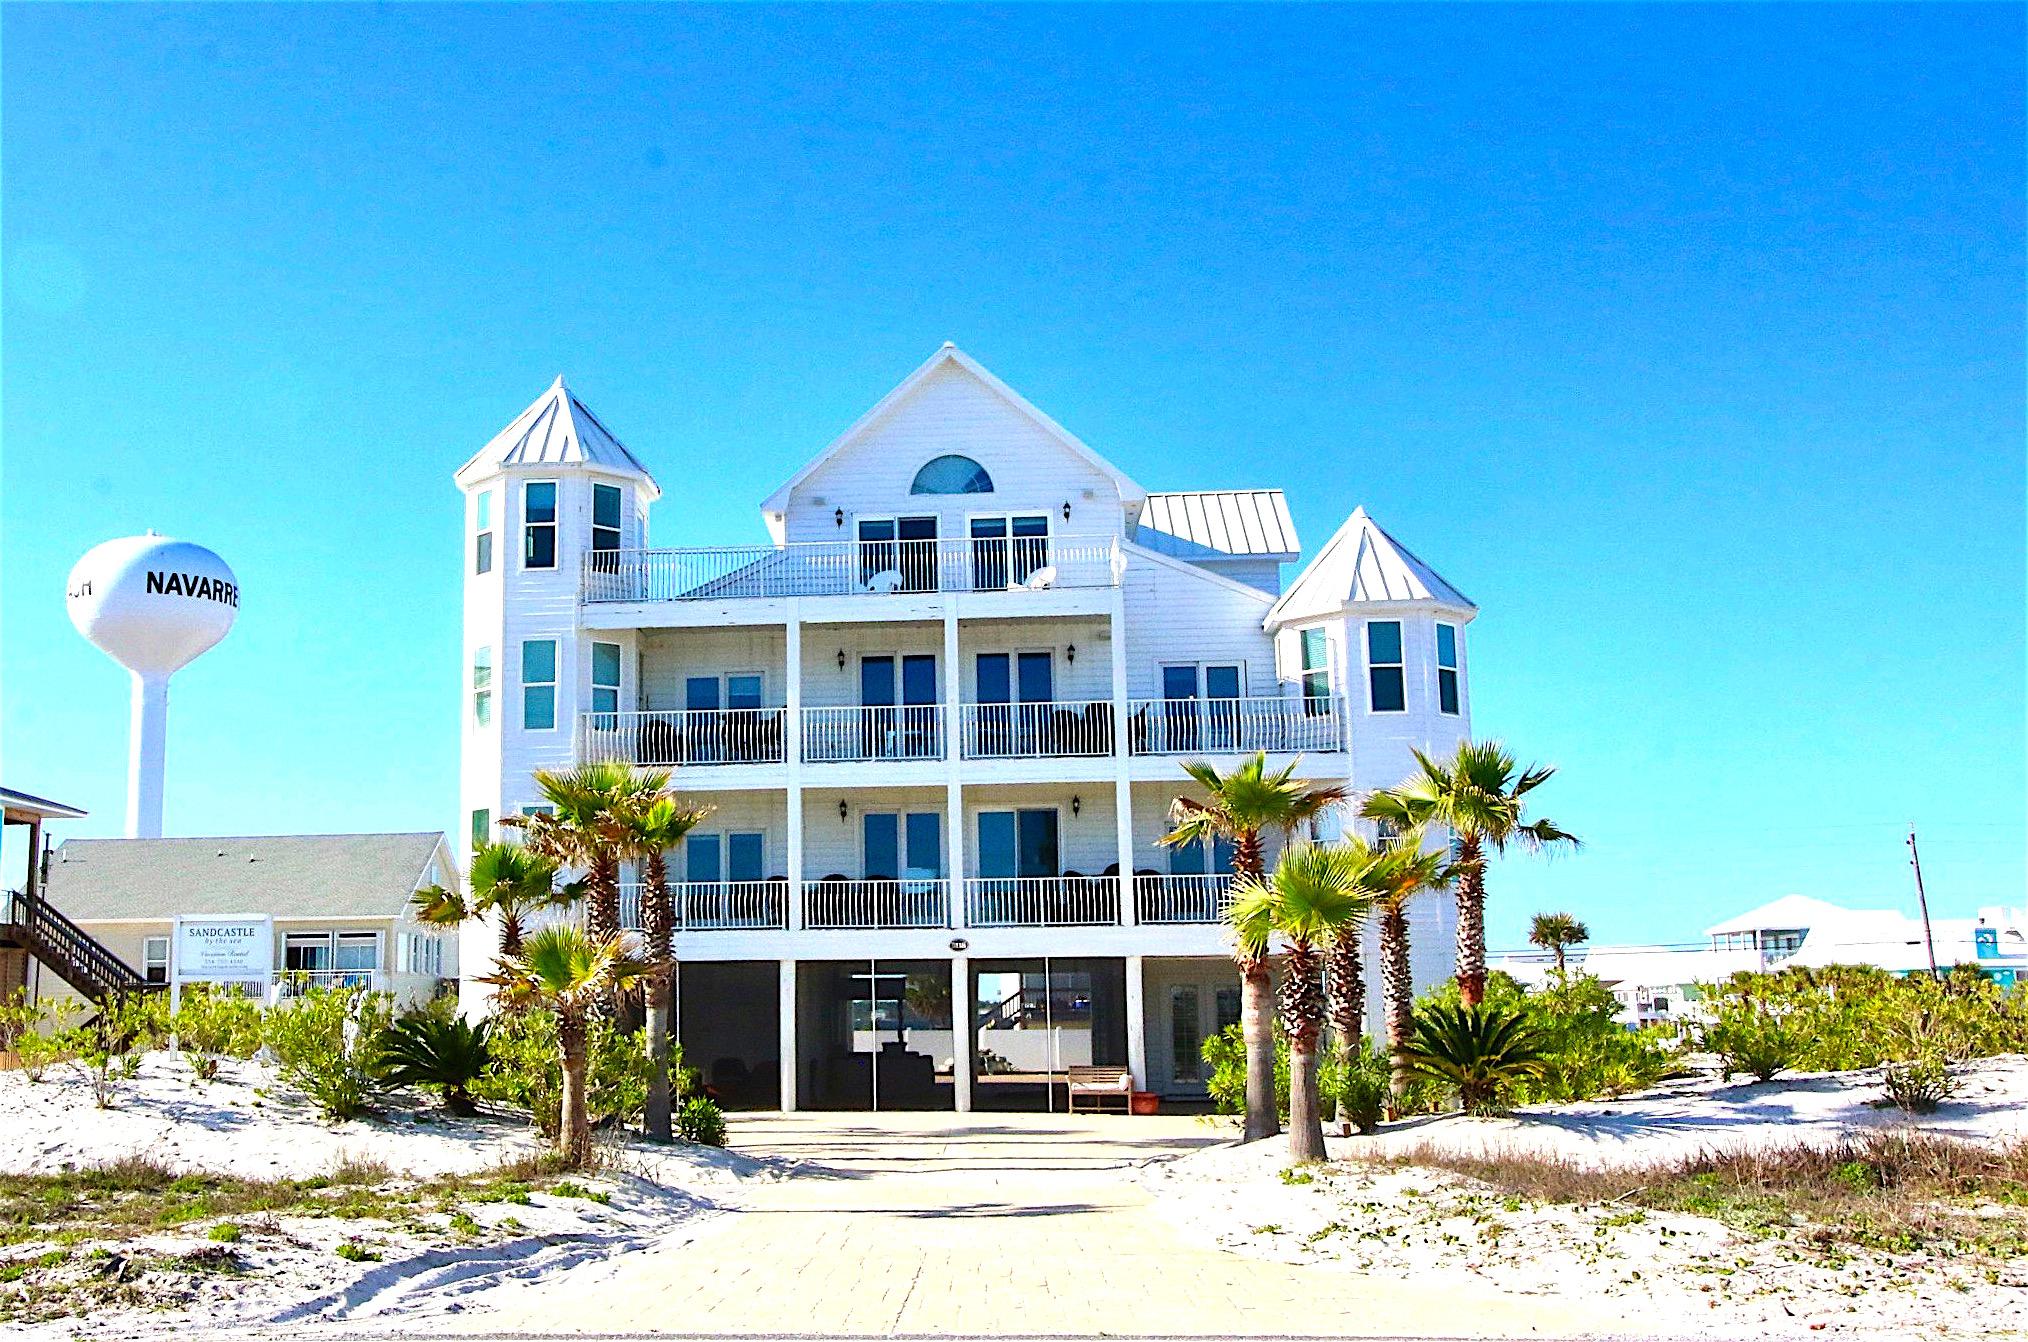 The Sandcastle - Navarre Beach, FL Sleeps 20+ - Castles for Rent in Navarre,  Florida, United States